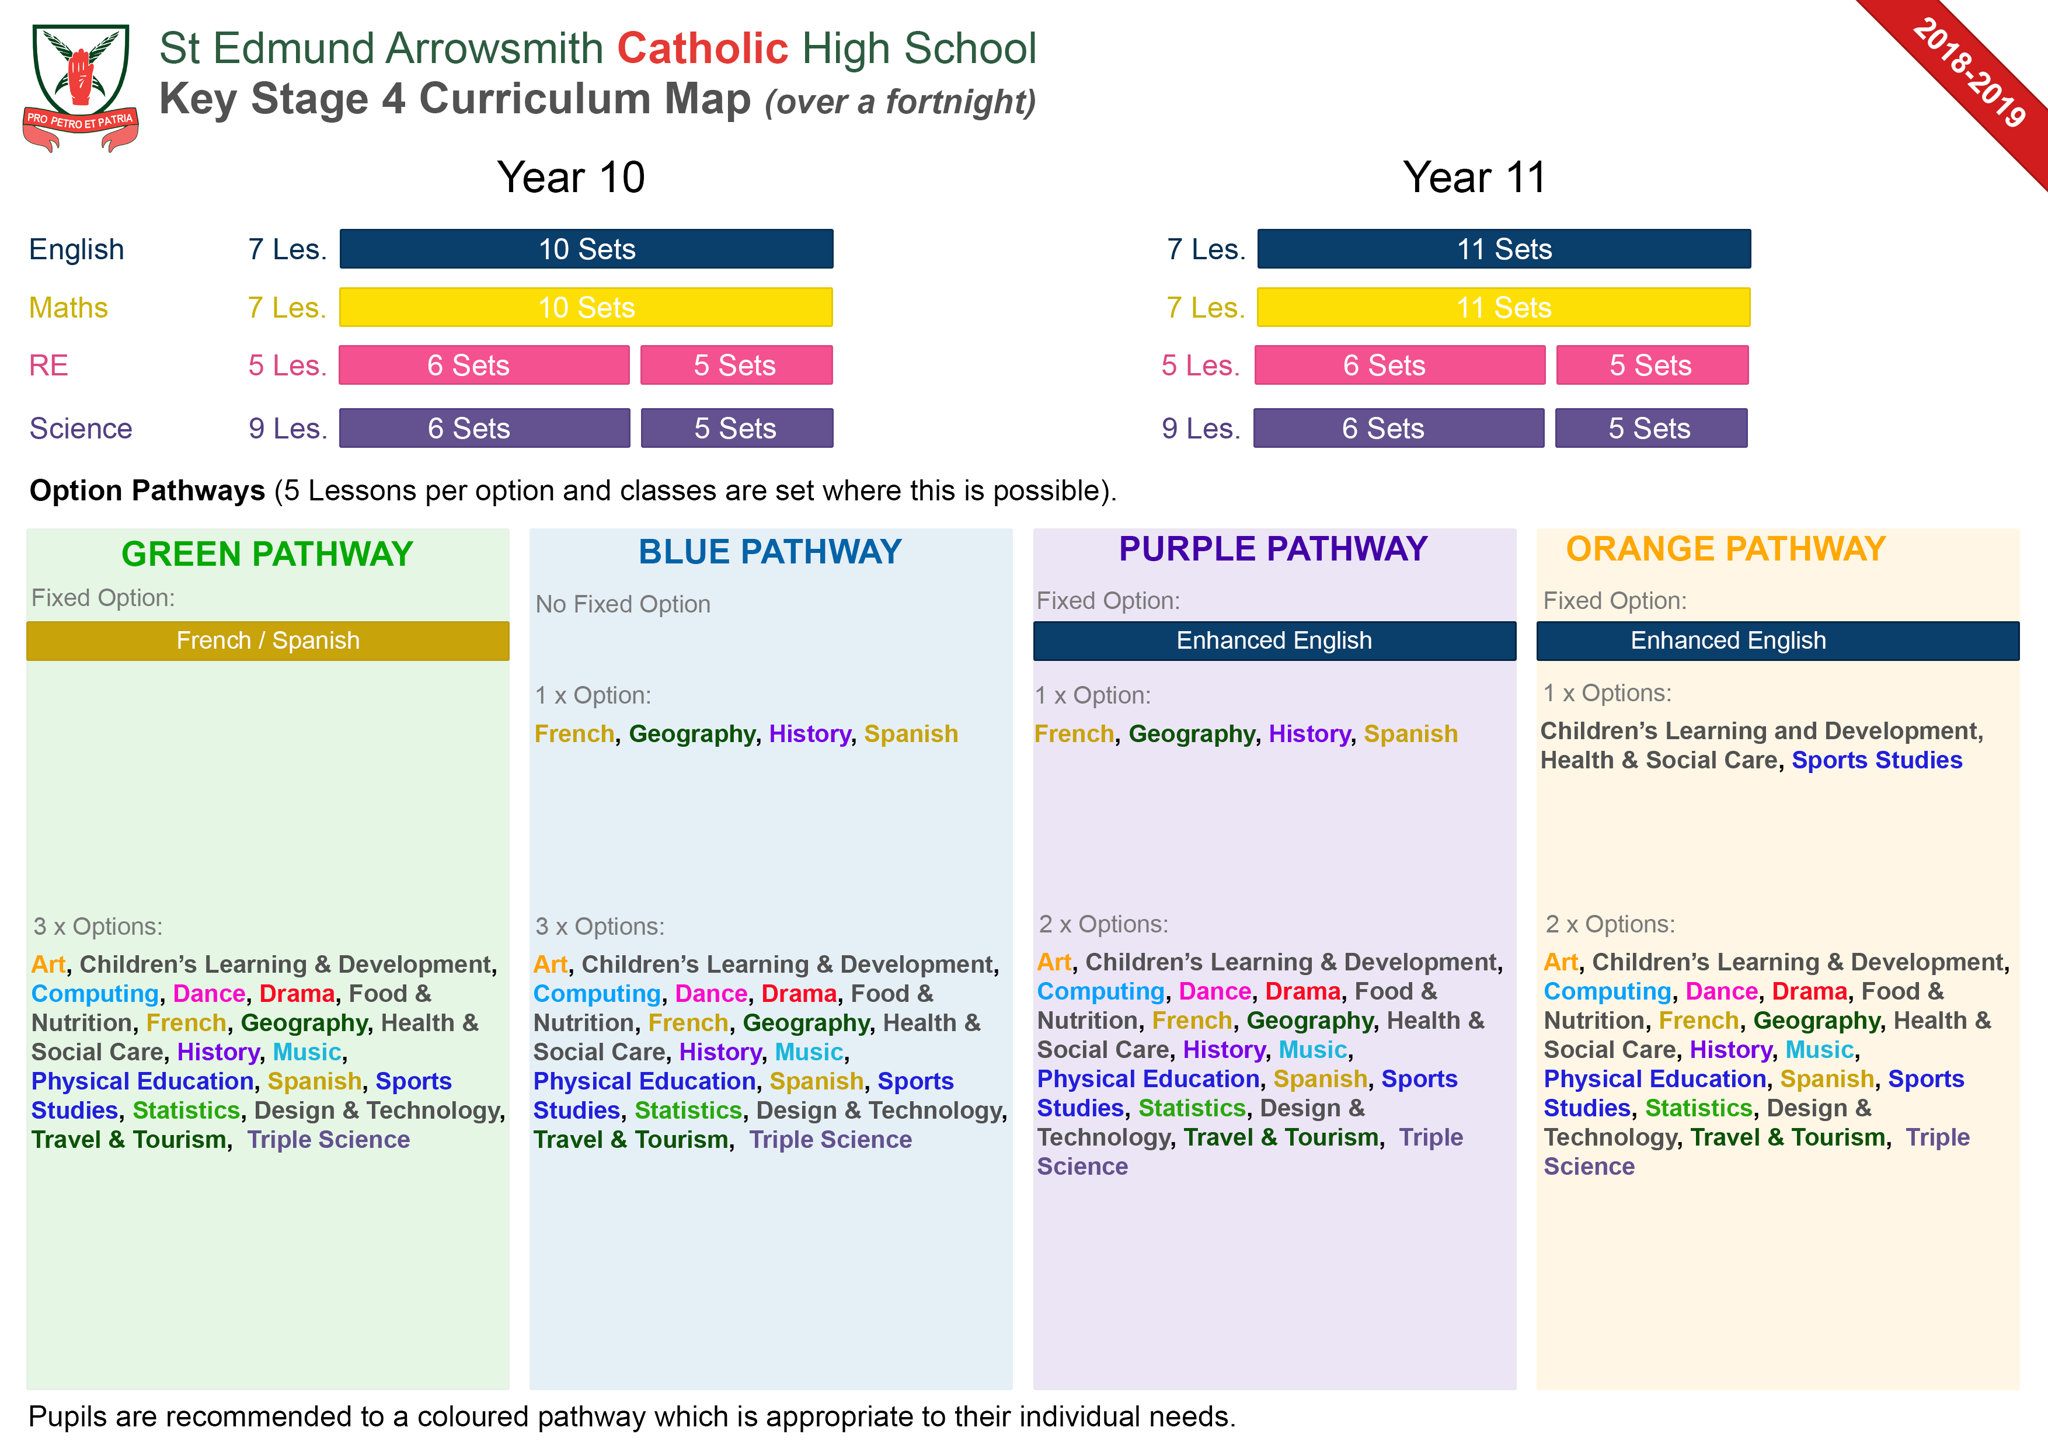 Key Stage 4 Curriculum Map St Edmund Arrowsmith Catholic High School - Us-history-curriculum-map